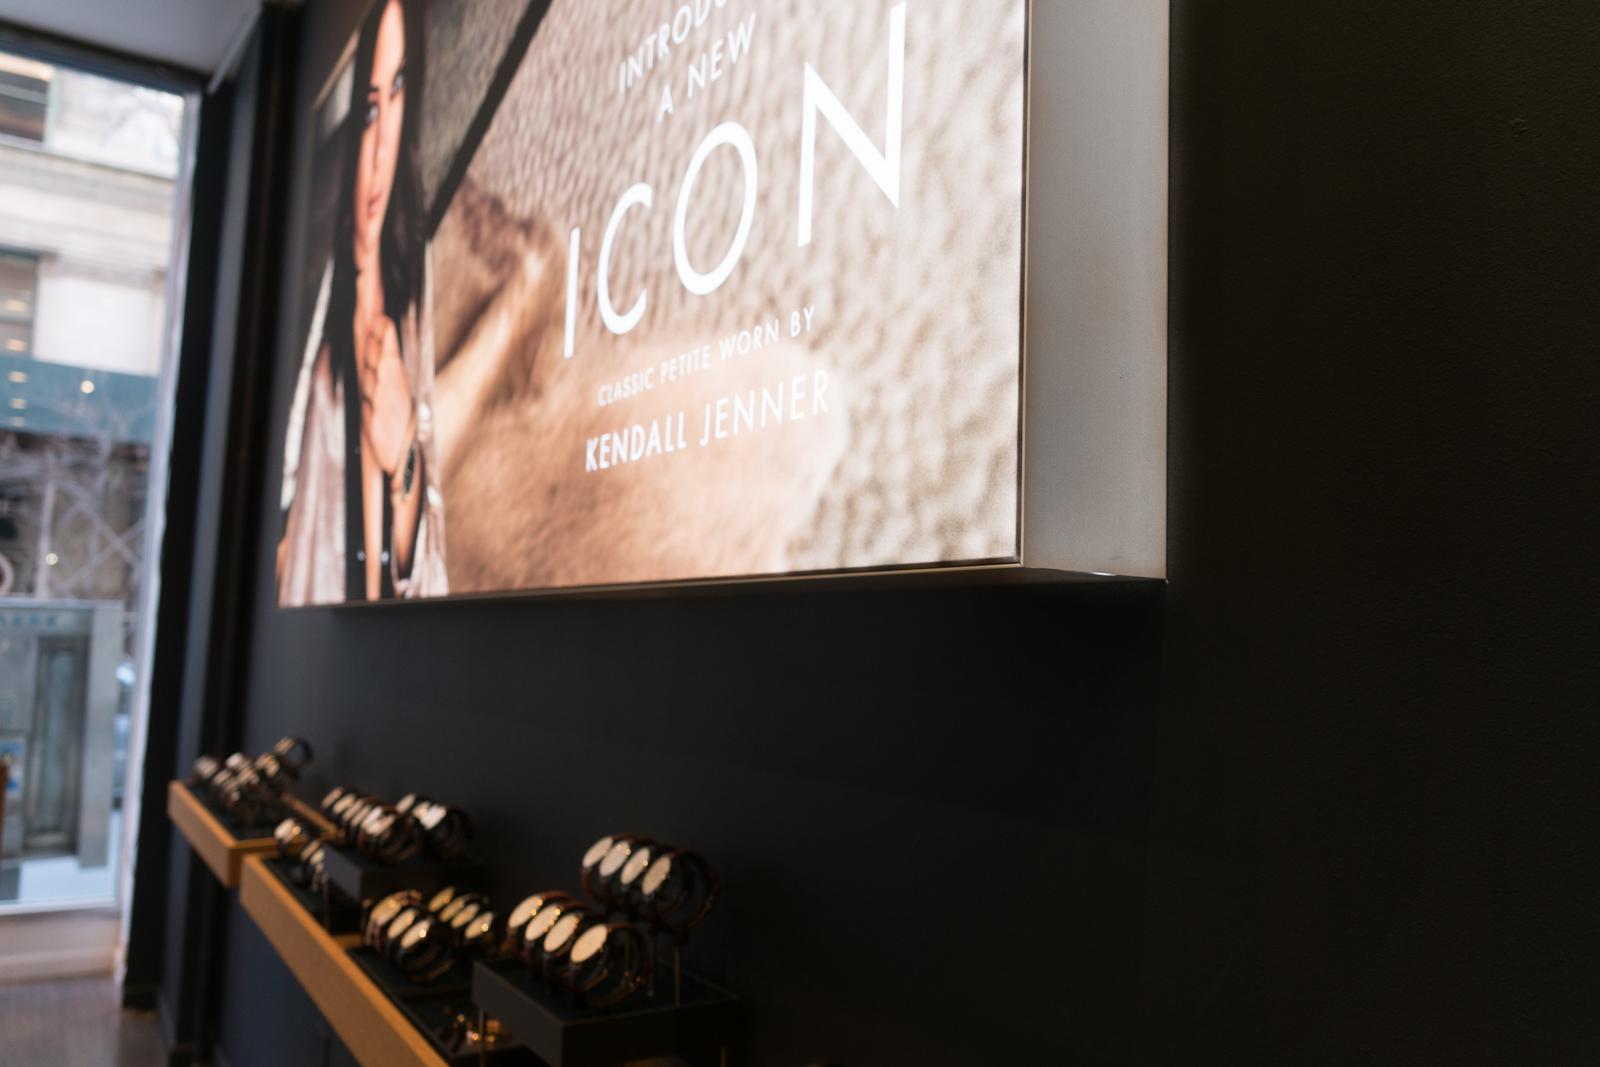 retail signage backlit SEG stretch tension fabric printing light box frameless edgeless large format duratrans